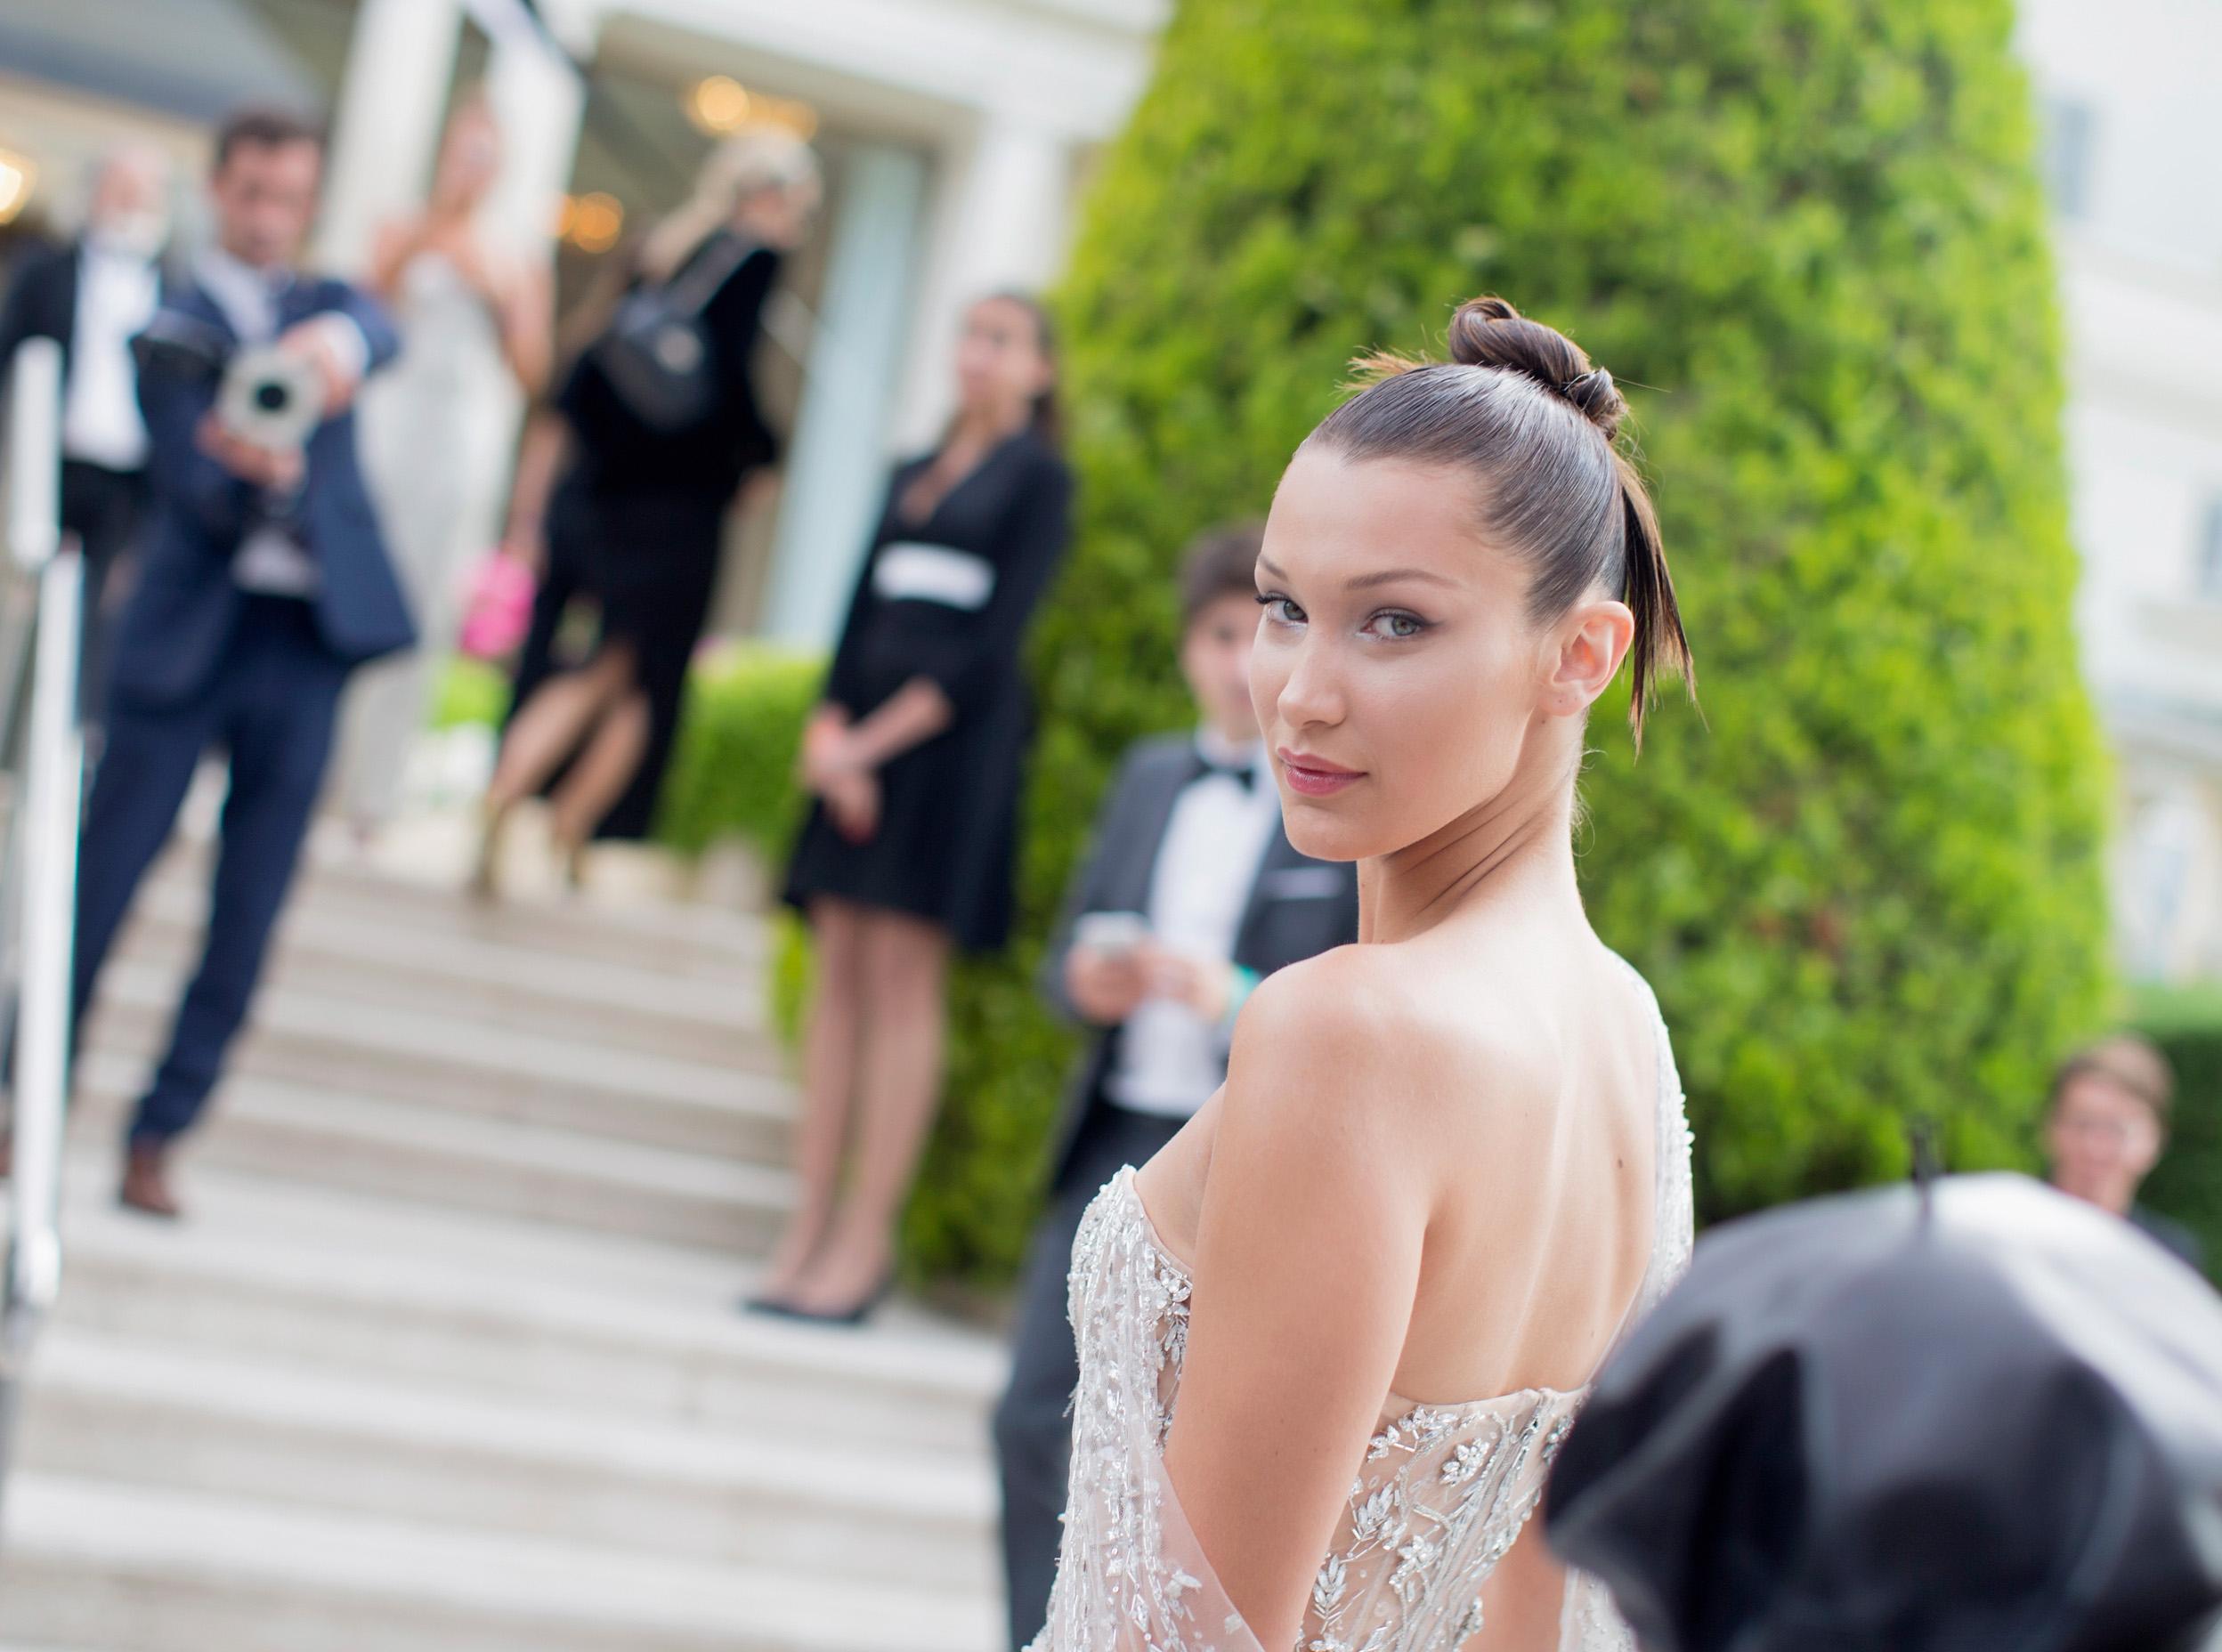 Bella Hadid Suffers Wardrobe Malfunction at Cannes Film Festival